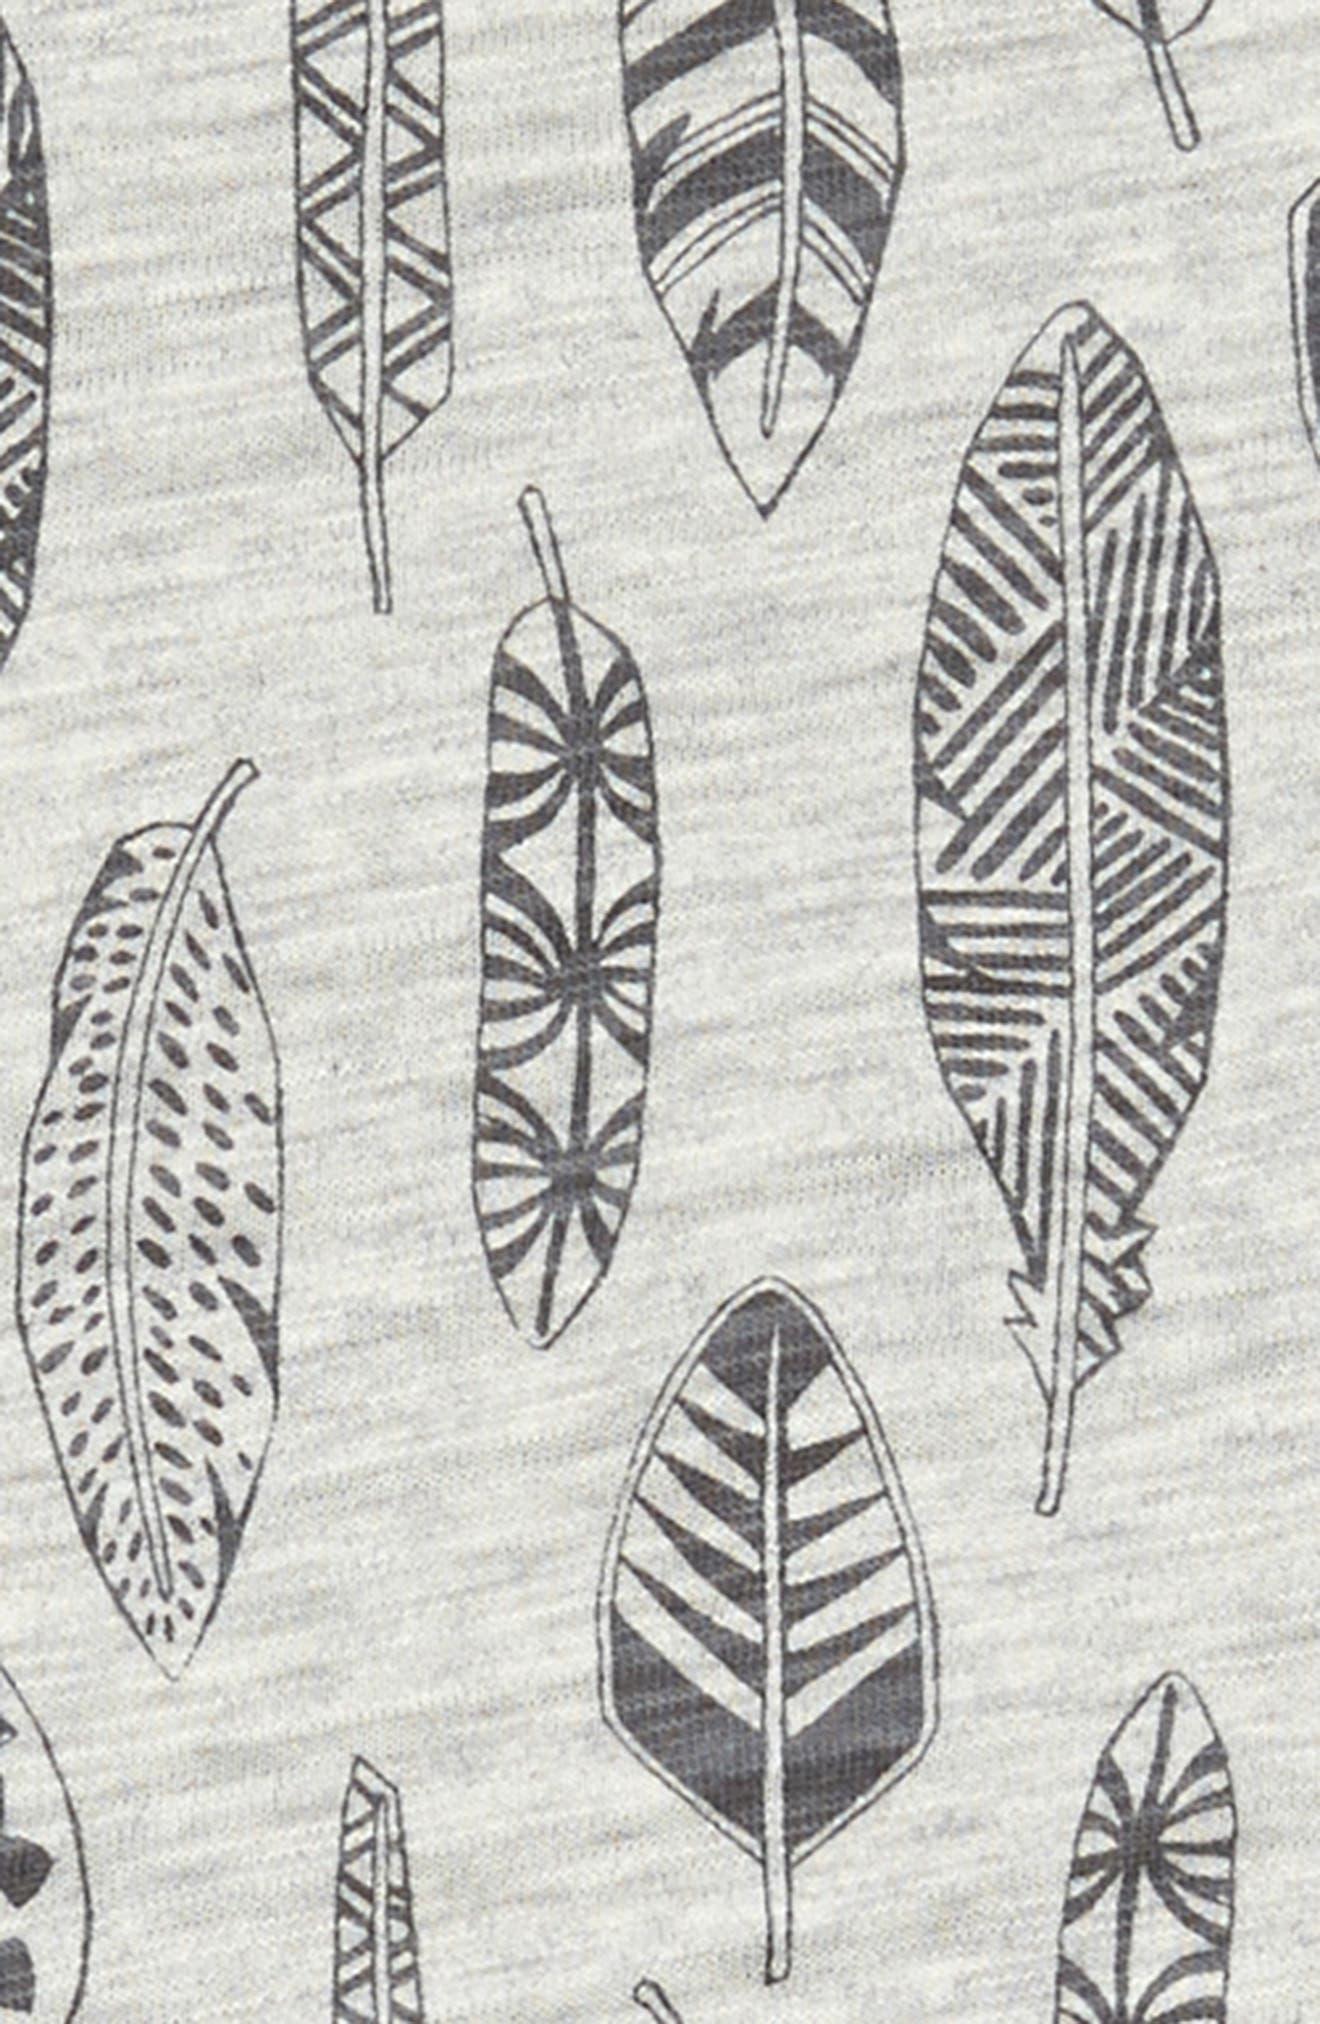 Feather Ruffle Sleeve Dress,                             Alternate thumbnail 3, color,